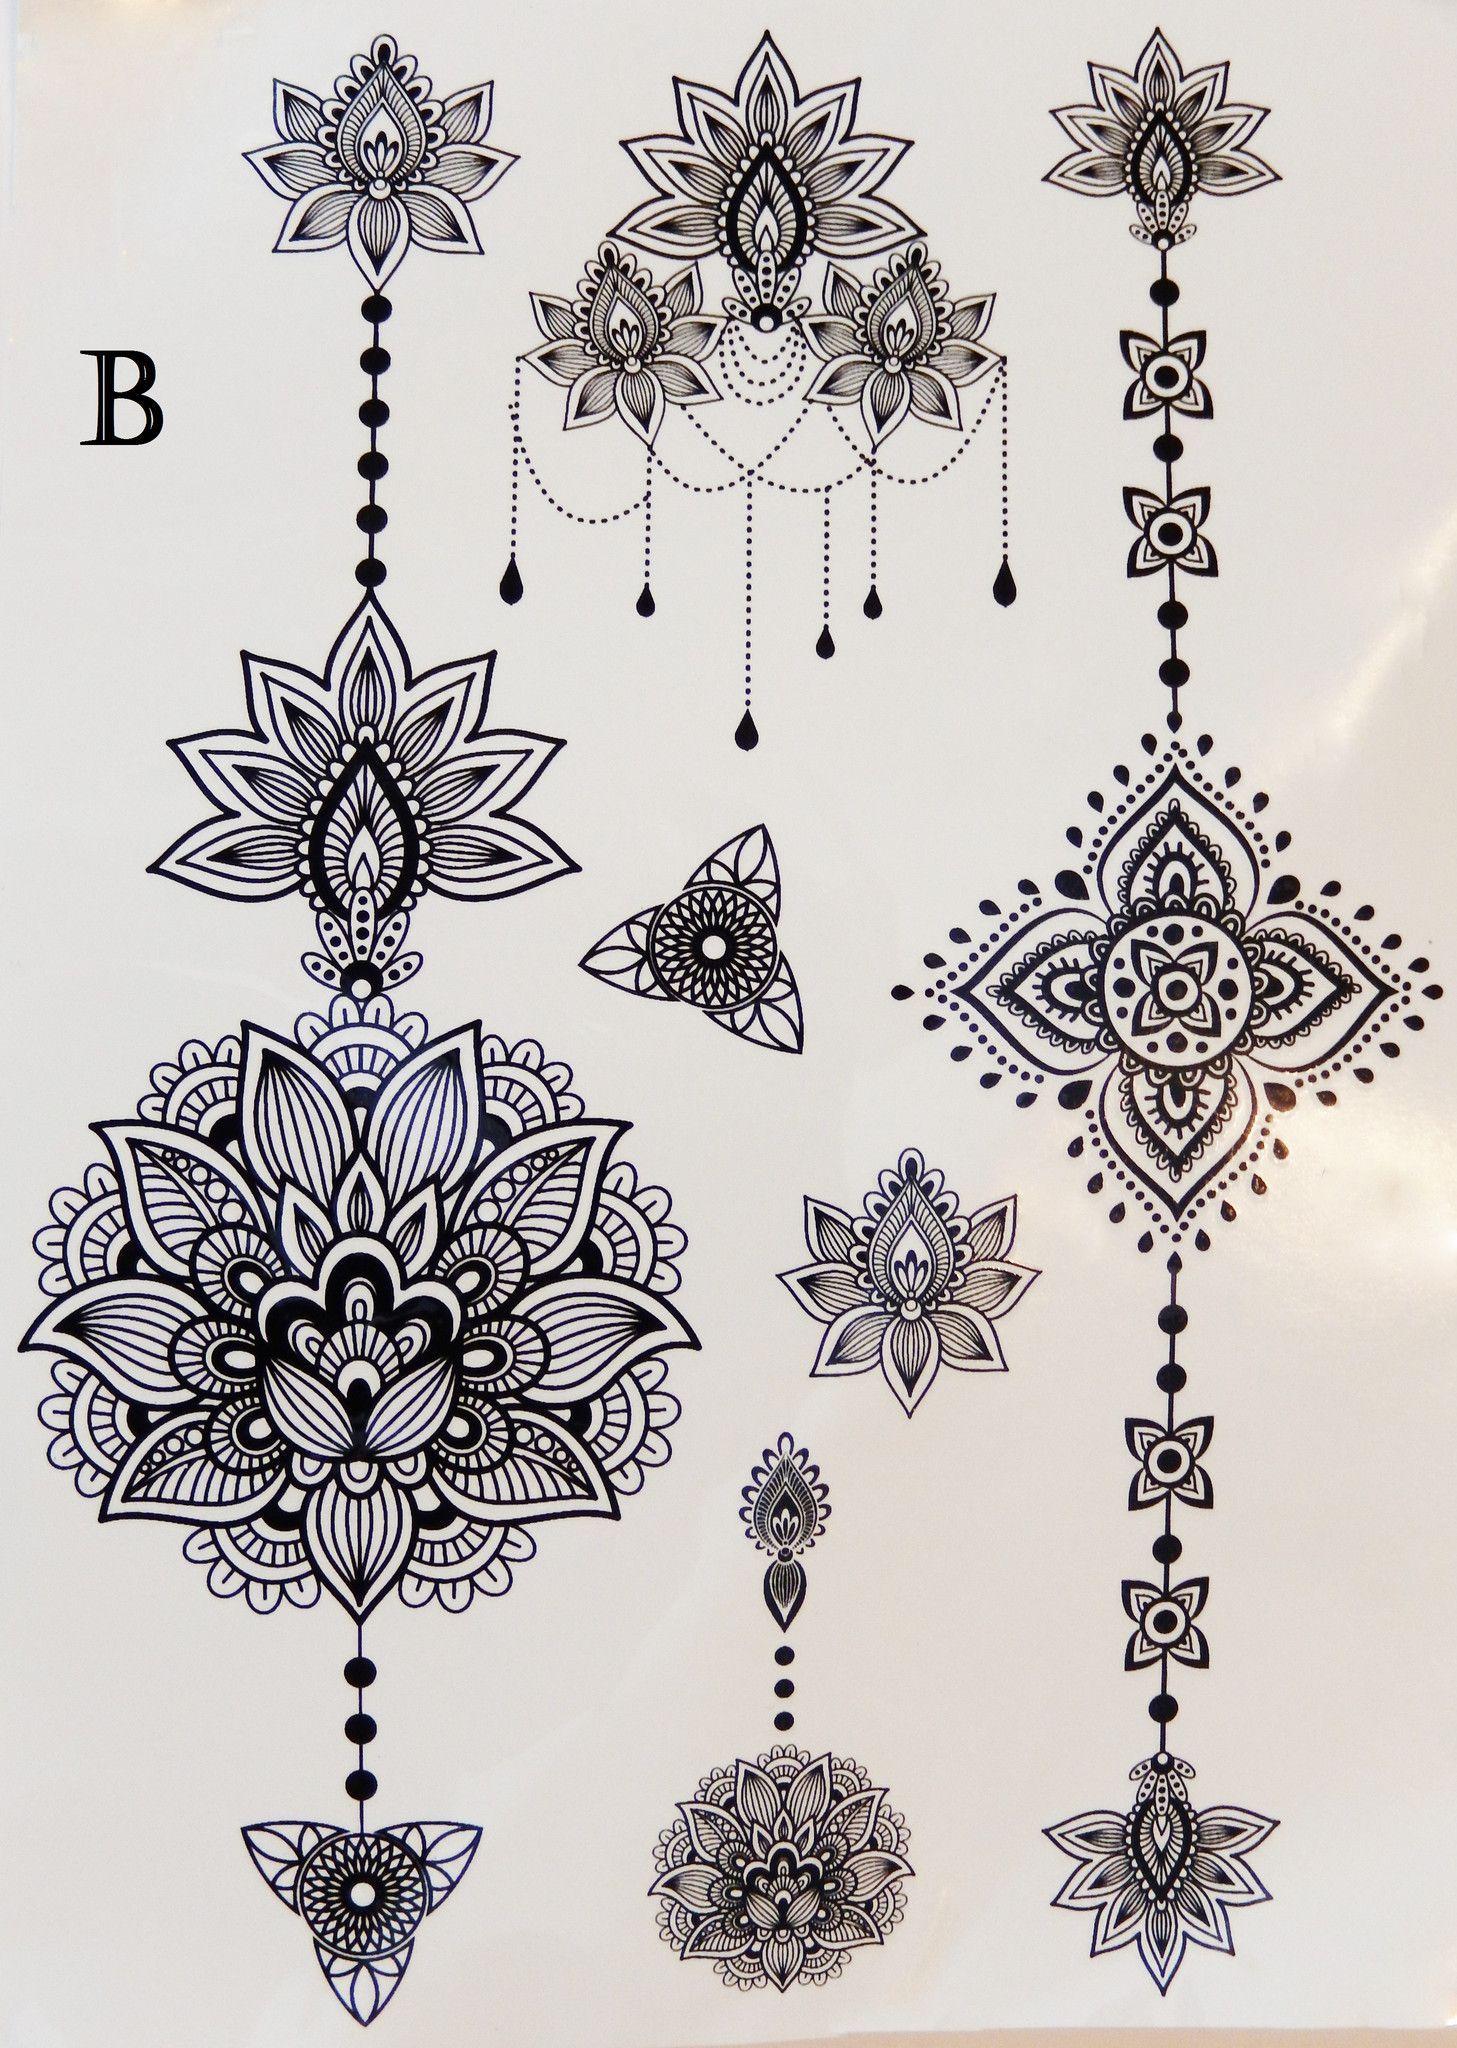 Henna Tattoo Designs Black: Metallic Or Black Henna Temporary Flash Tattoos